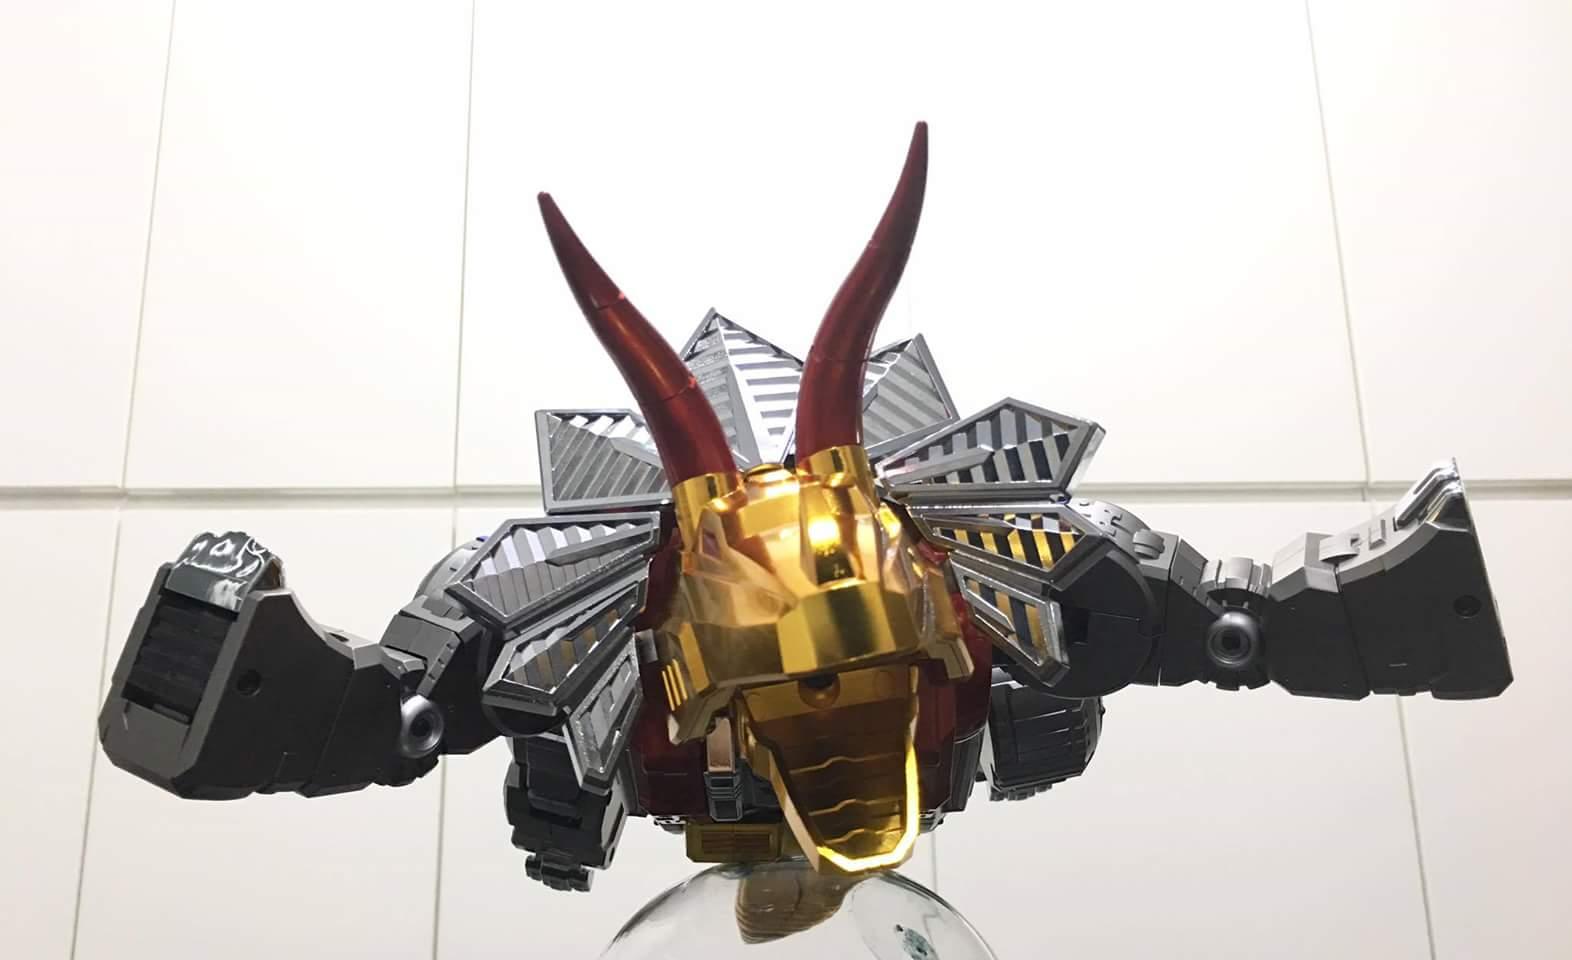 [GigaPower] Produit Tiers - Jouets HQ-01 Superator + HQ-02 Grassor + HQ-03 Guttur + HQ-04 Graviter + HQ-05 Gaudenter - aka Dinobots - Page 4 QKoe7Gfe